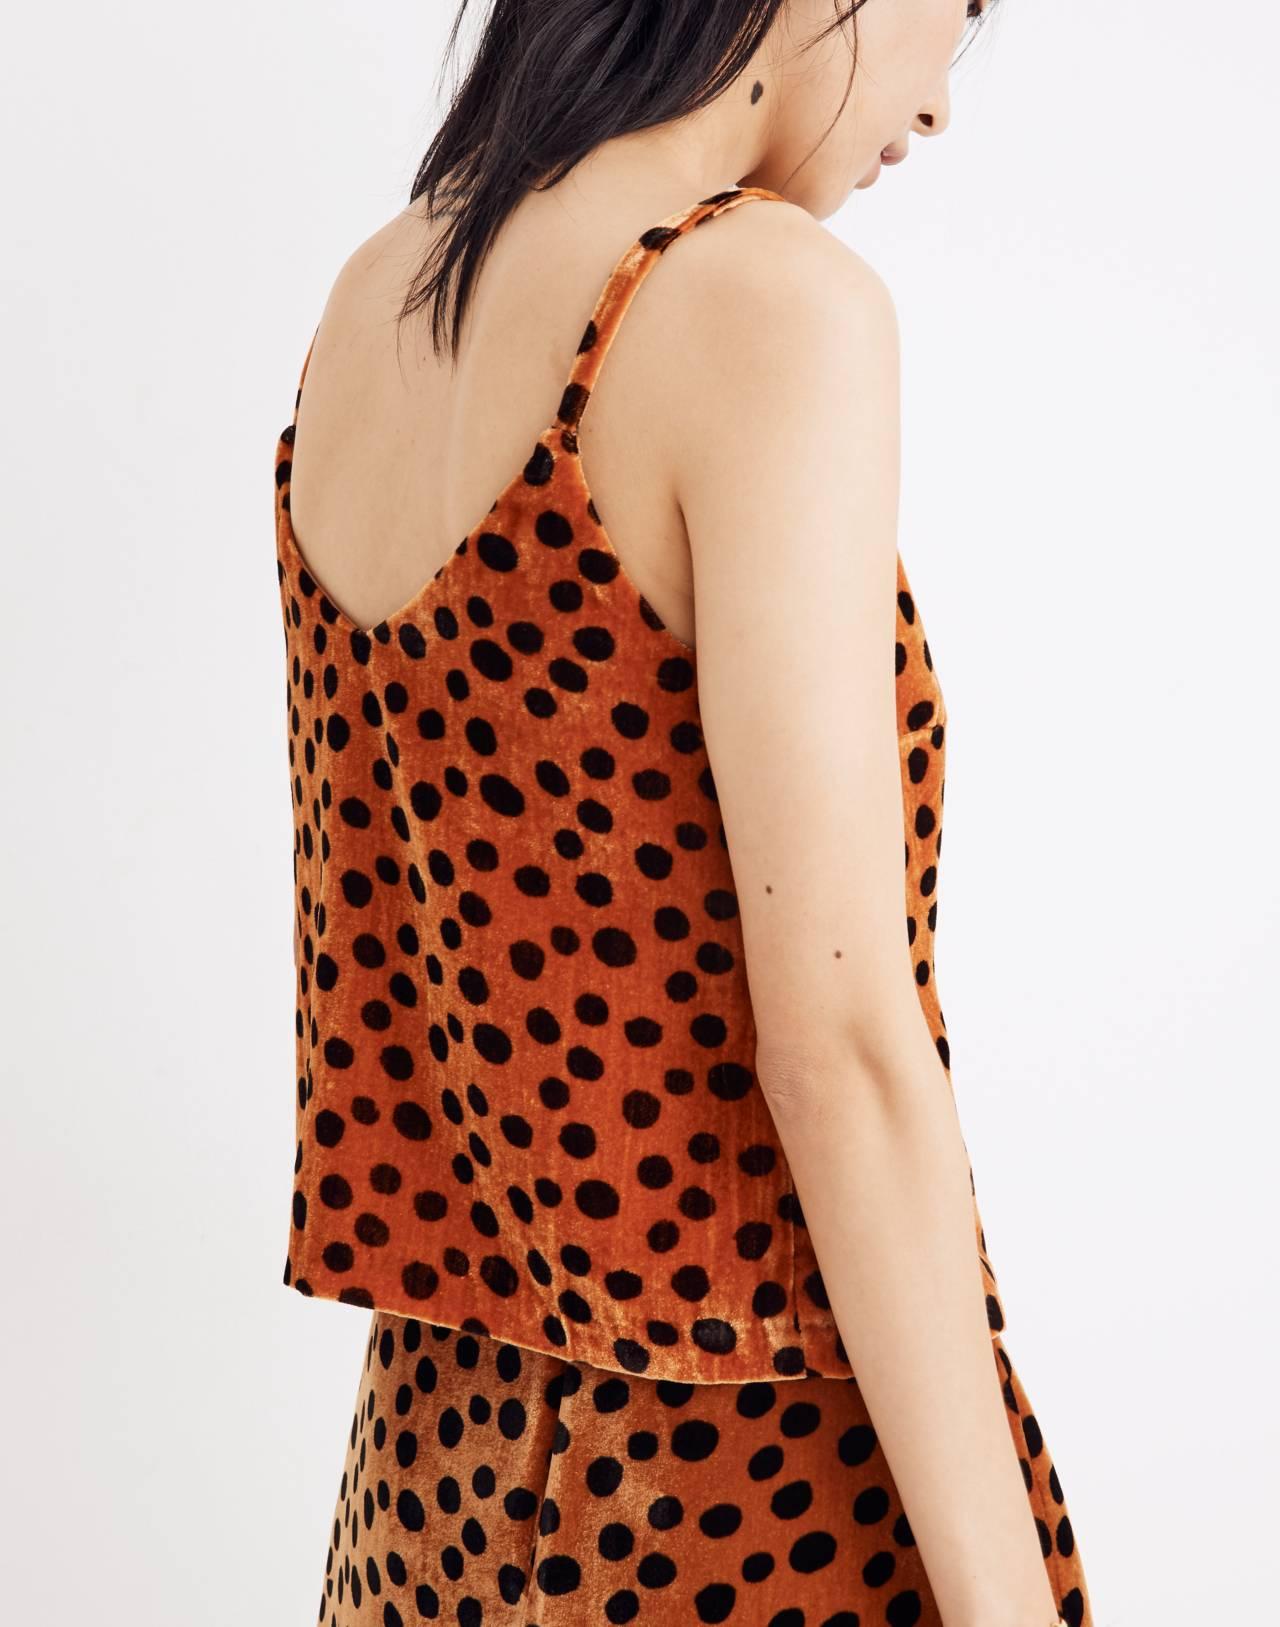 Velvet Button-Front Cami in Leopard Dot in leopard dot burnt sienna image 3